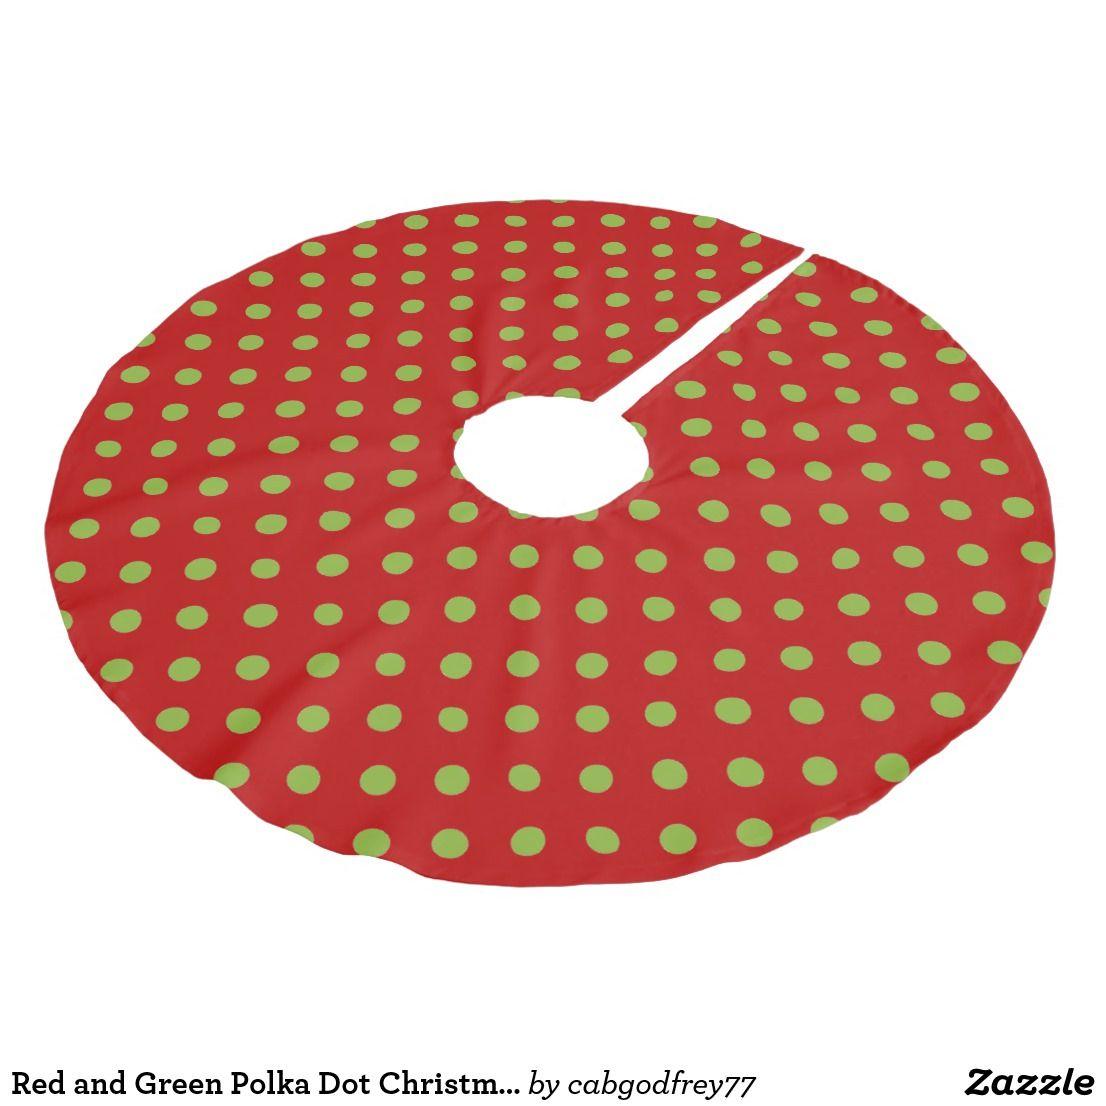 Red and Green Polka Dot Christmas Brushed Polyester Tree Skirt | Christmas tree skirt, Red ...